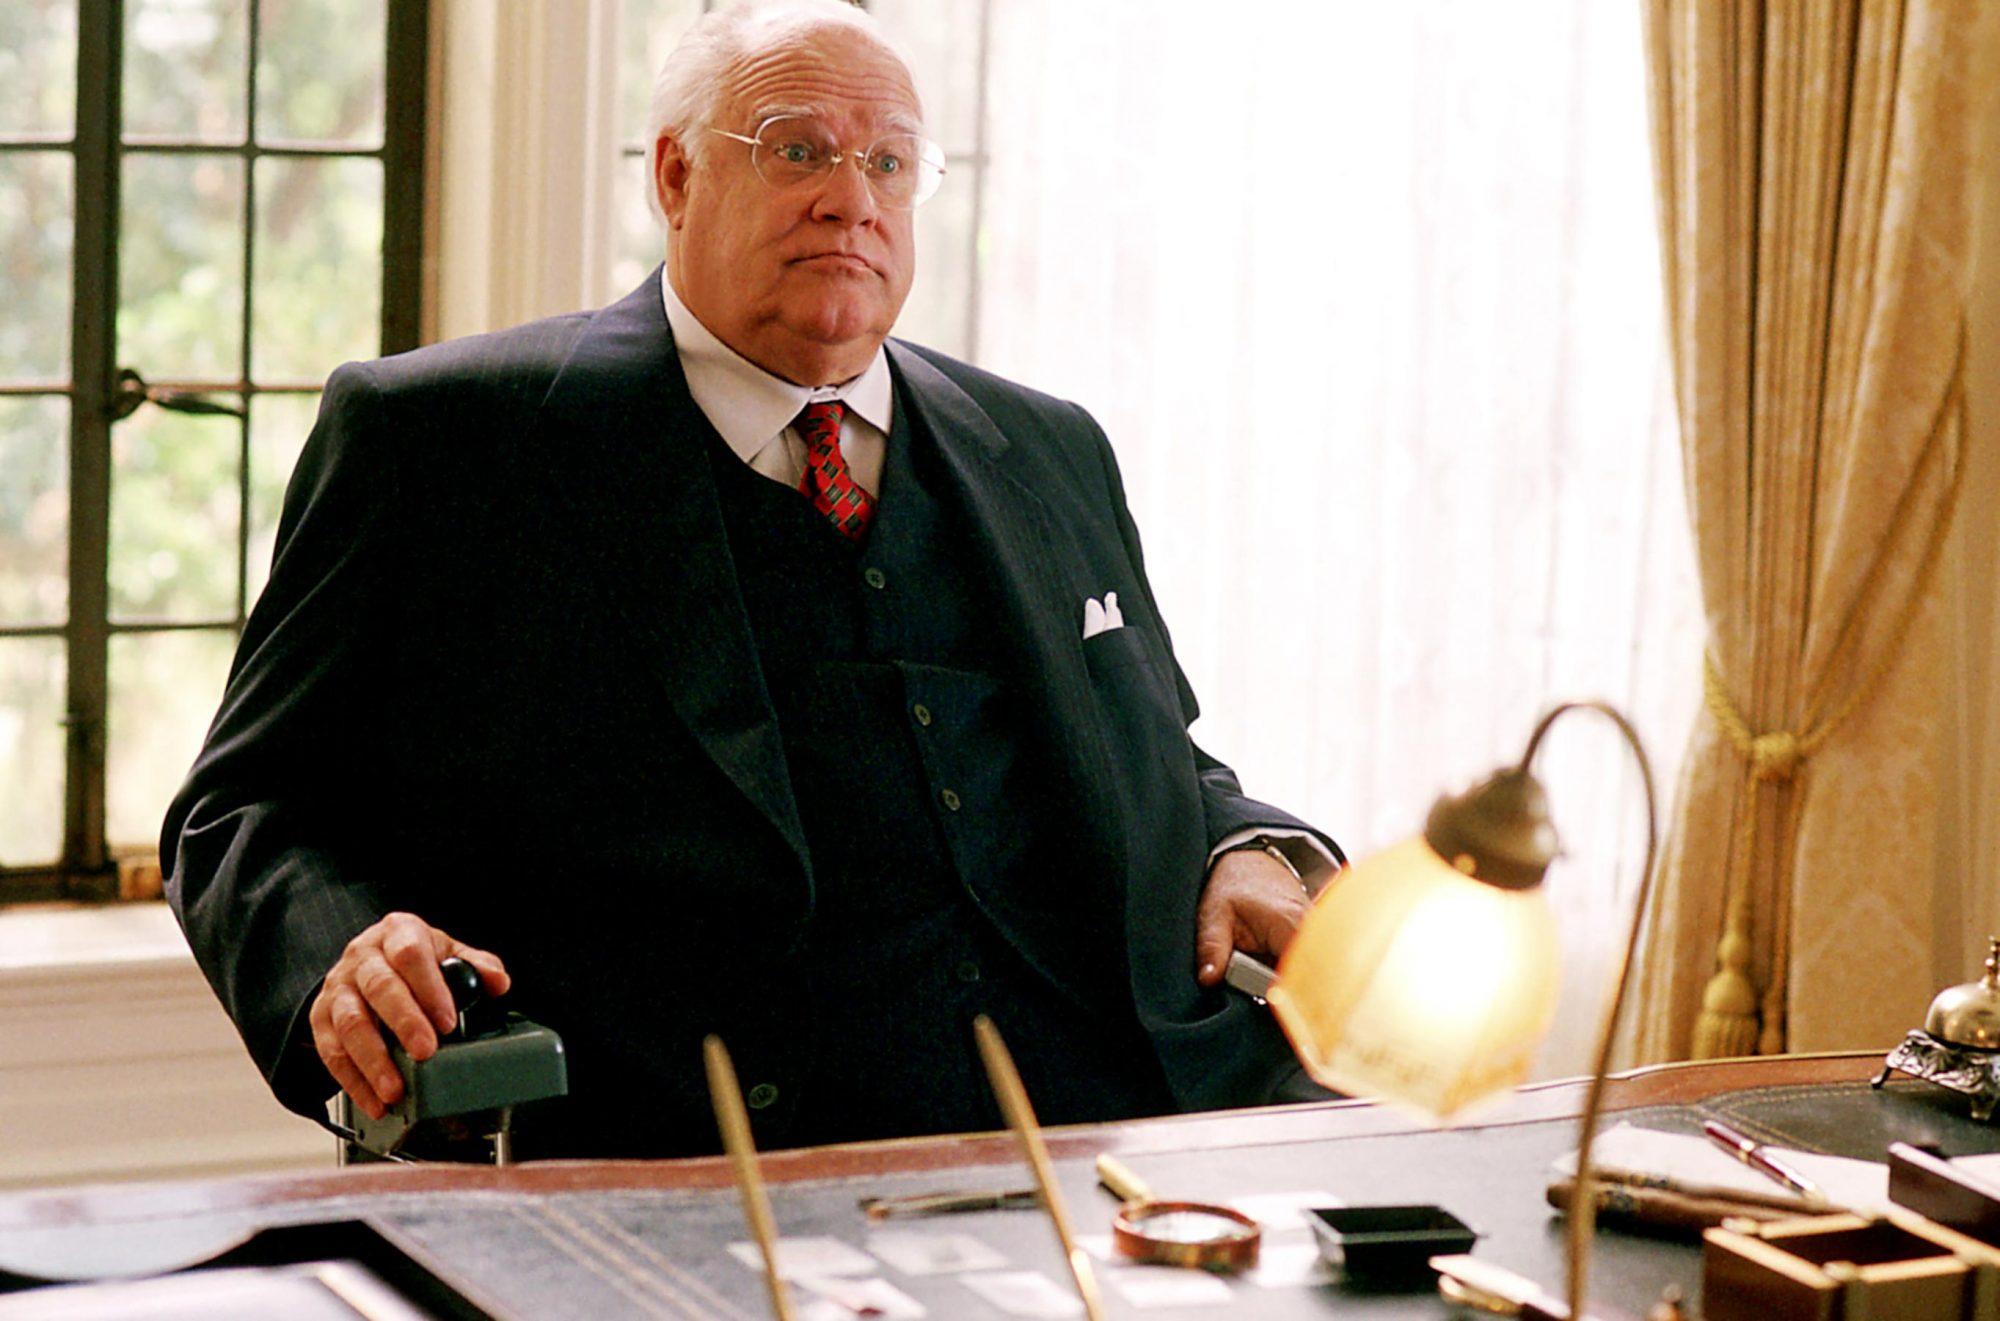 THE BIG LEBOWSKI, David Huddleston, 1998, (c) Gramercy Pictures/courtesy Everett Collection